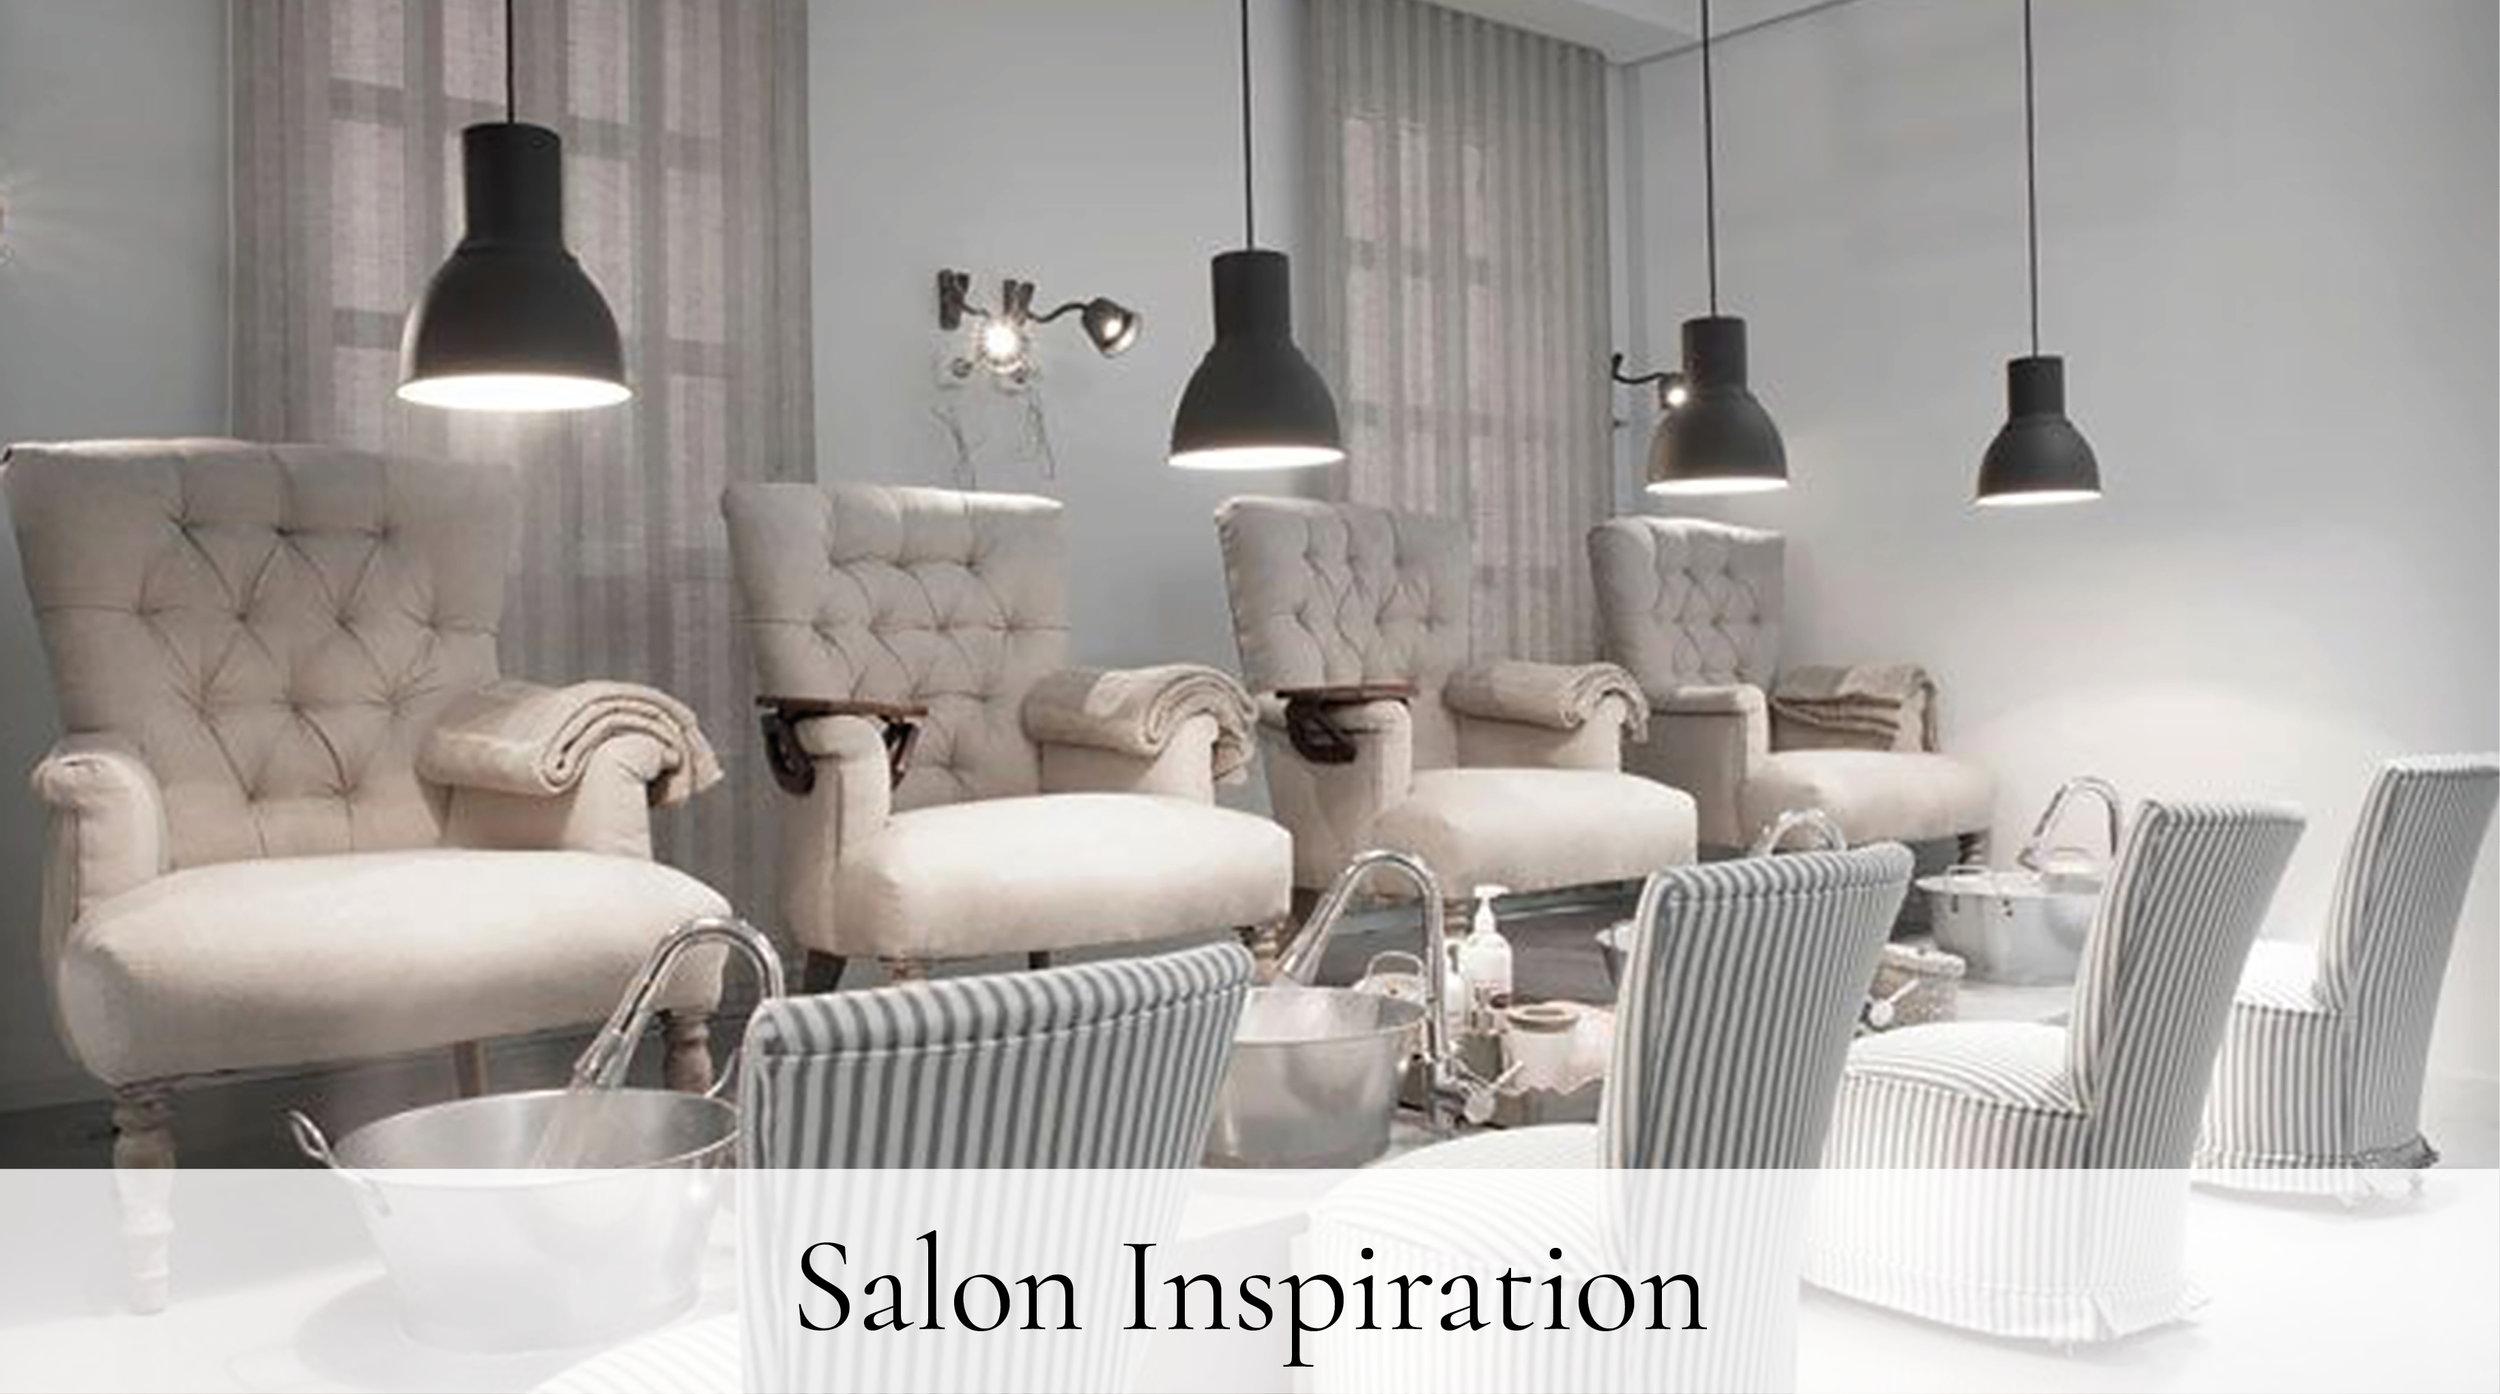 Salon Inspiration 1998.jpg